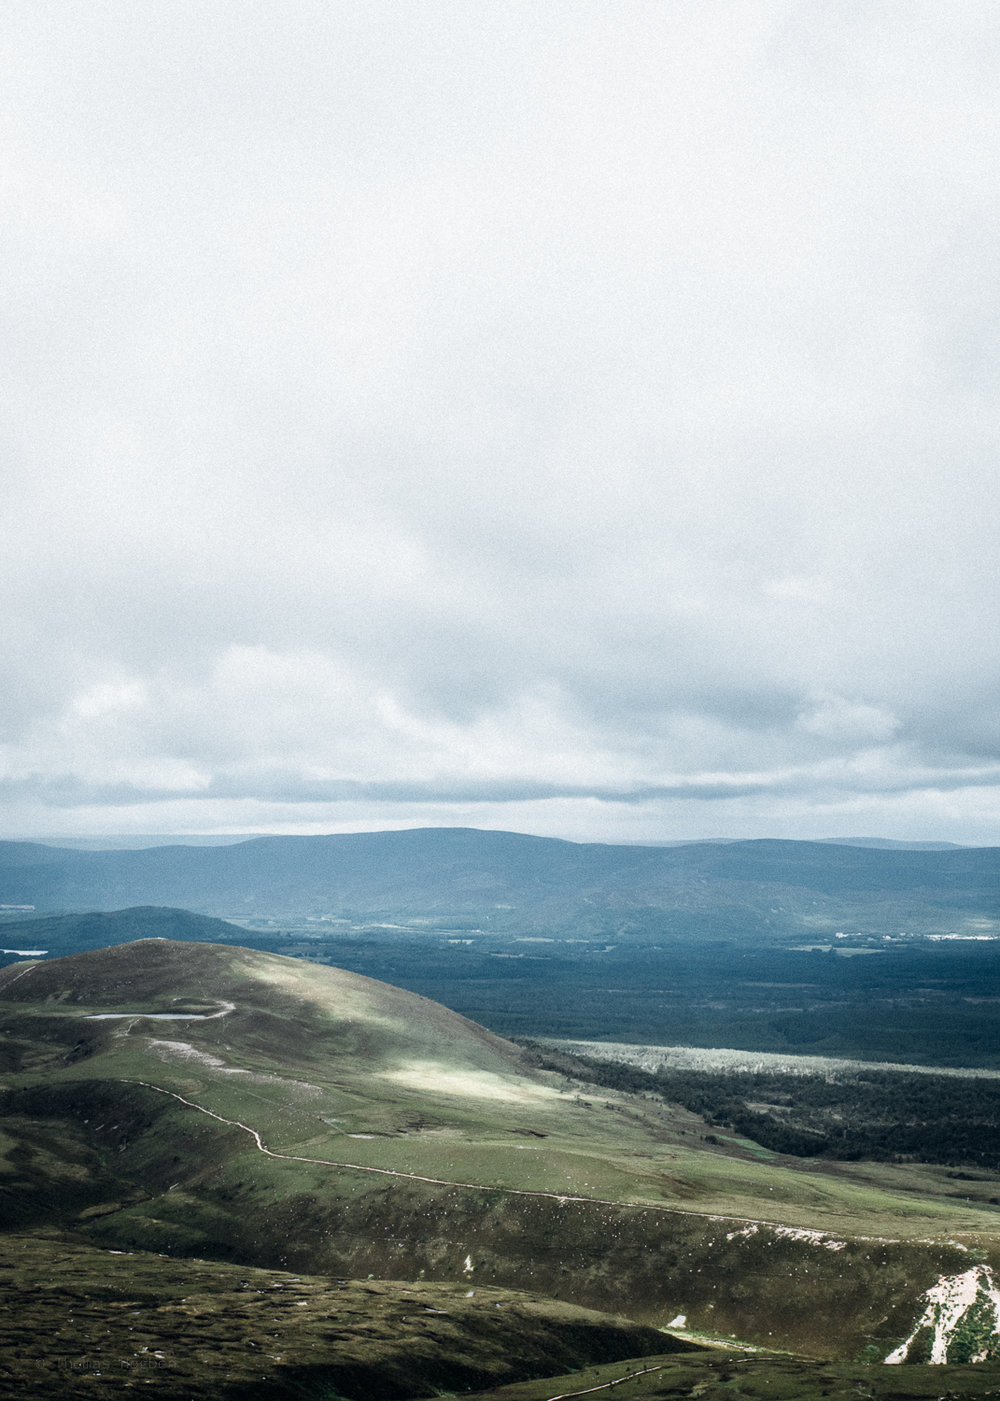 Glenmore-Navigation-July-web-1.jpg